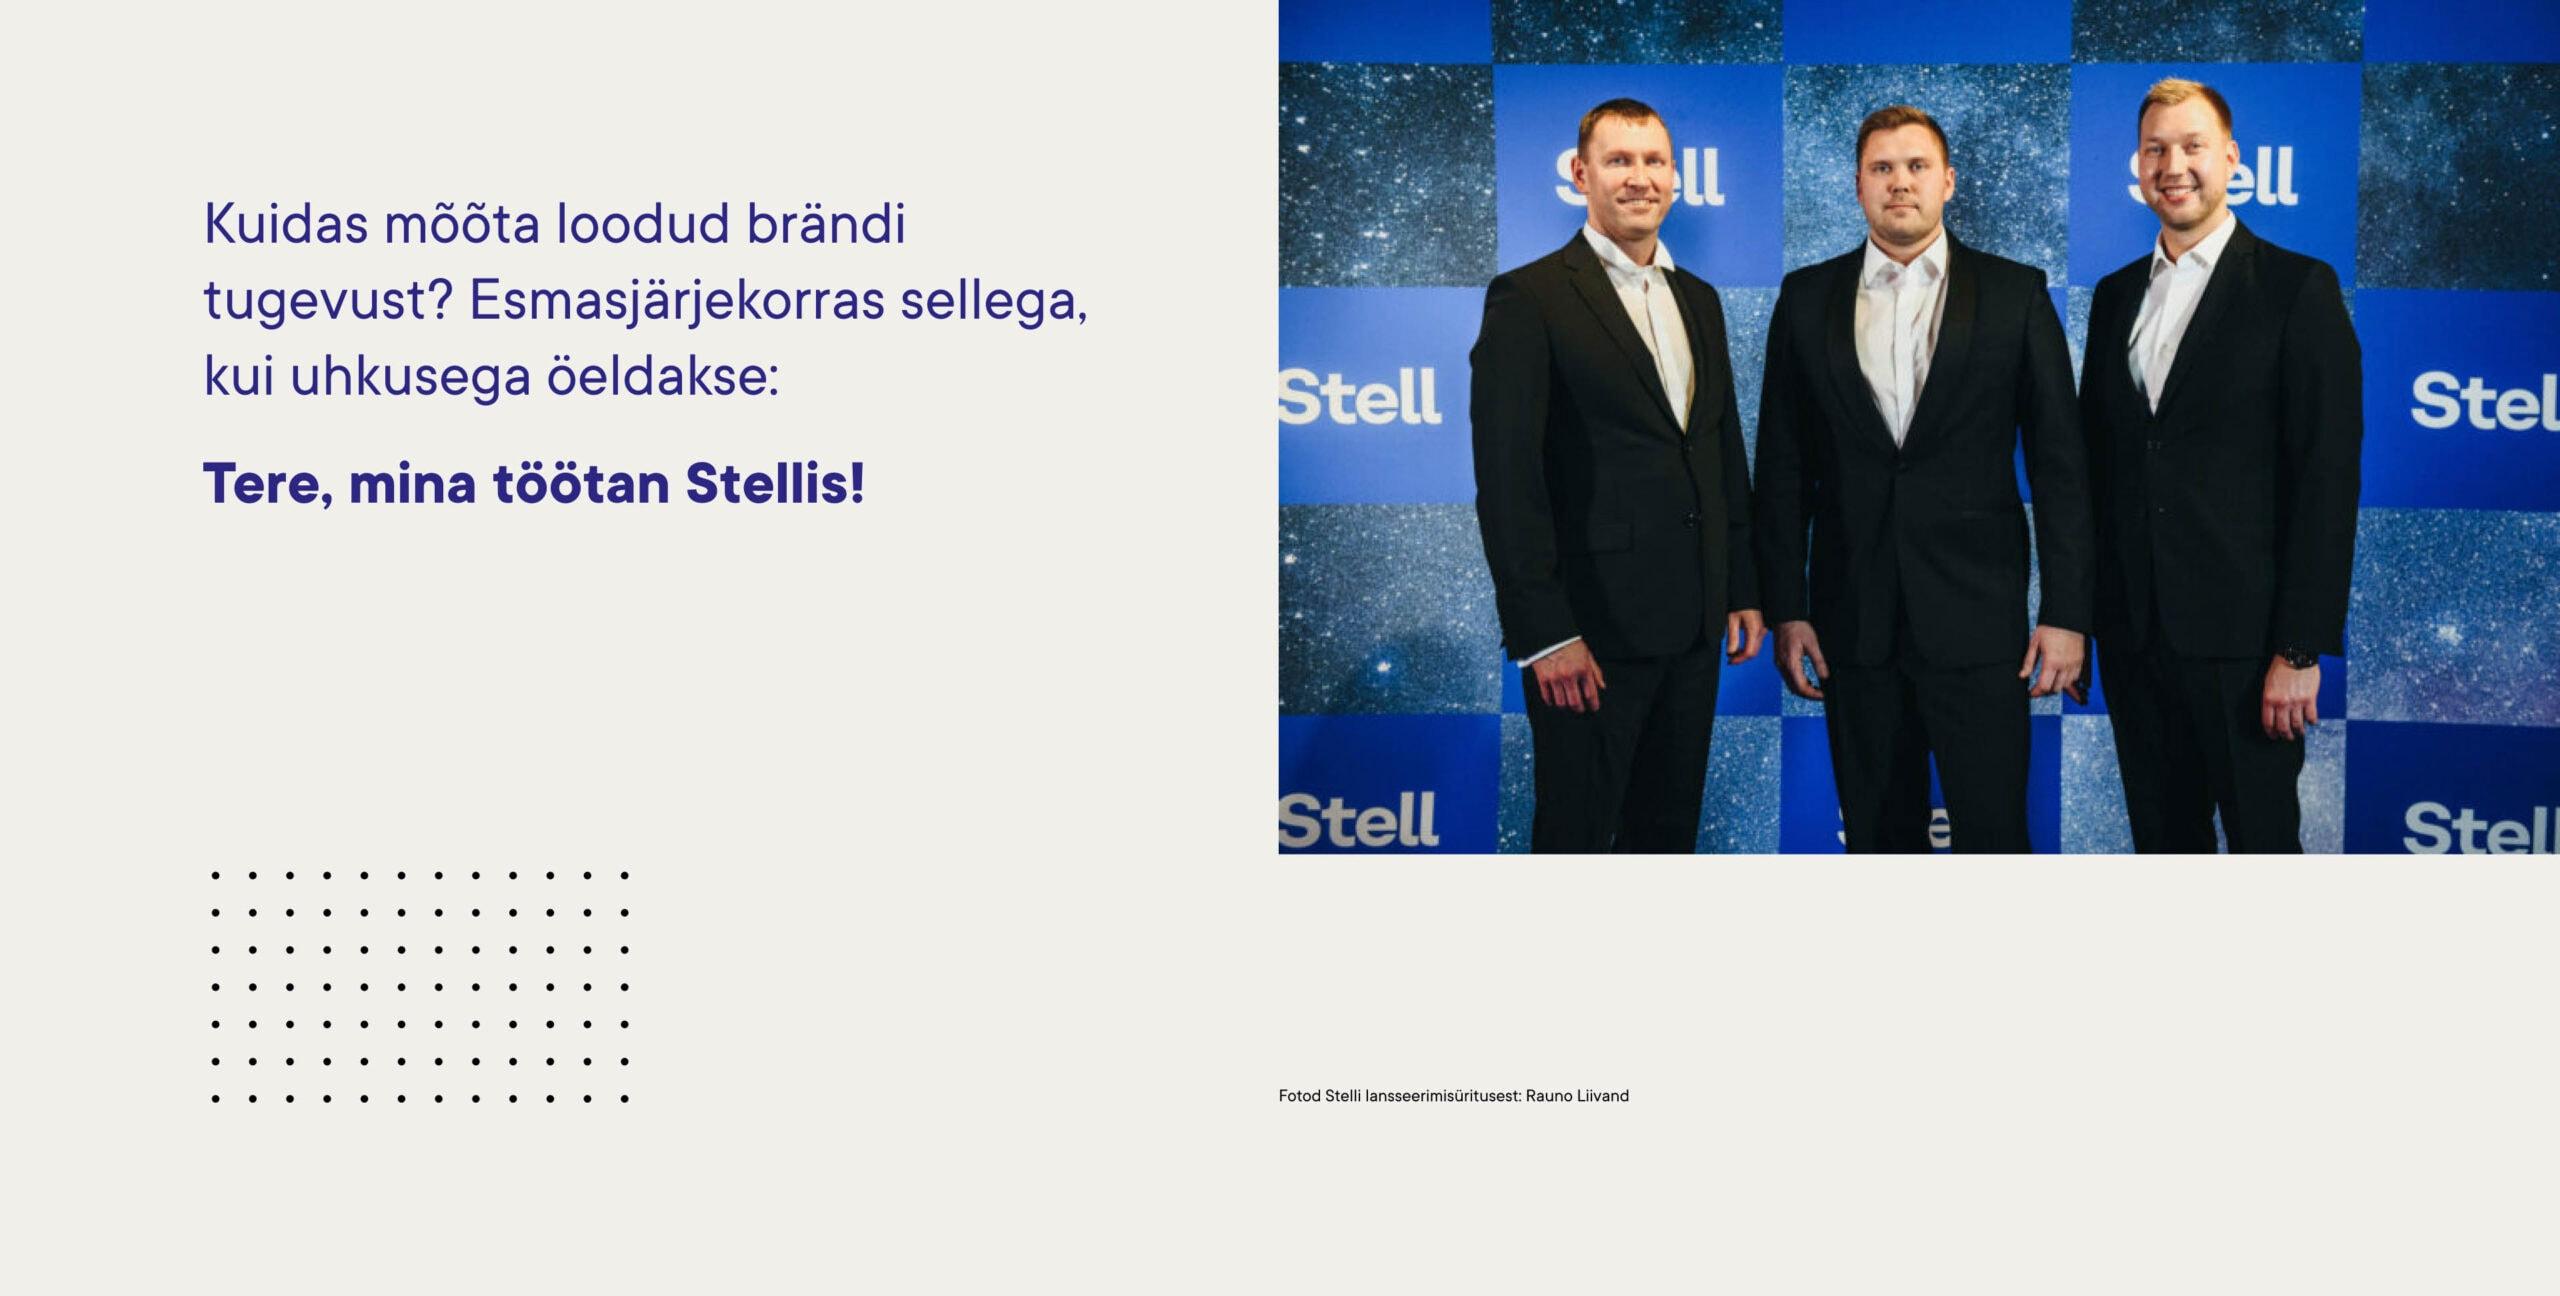 stell-fraktal-38-l1